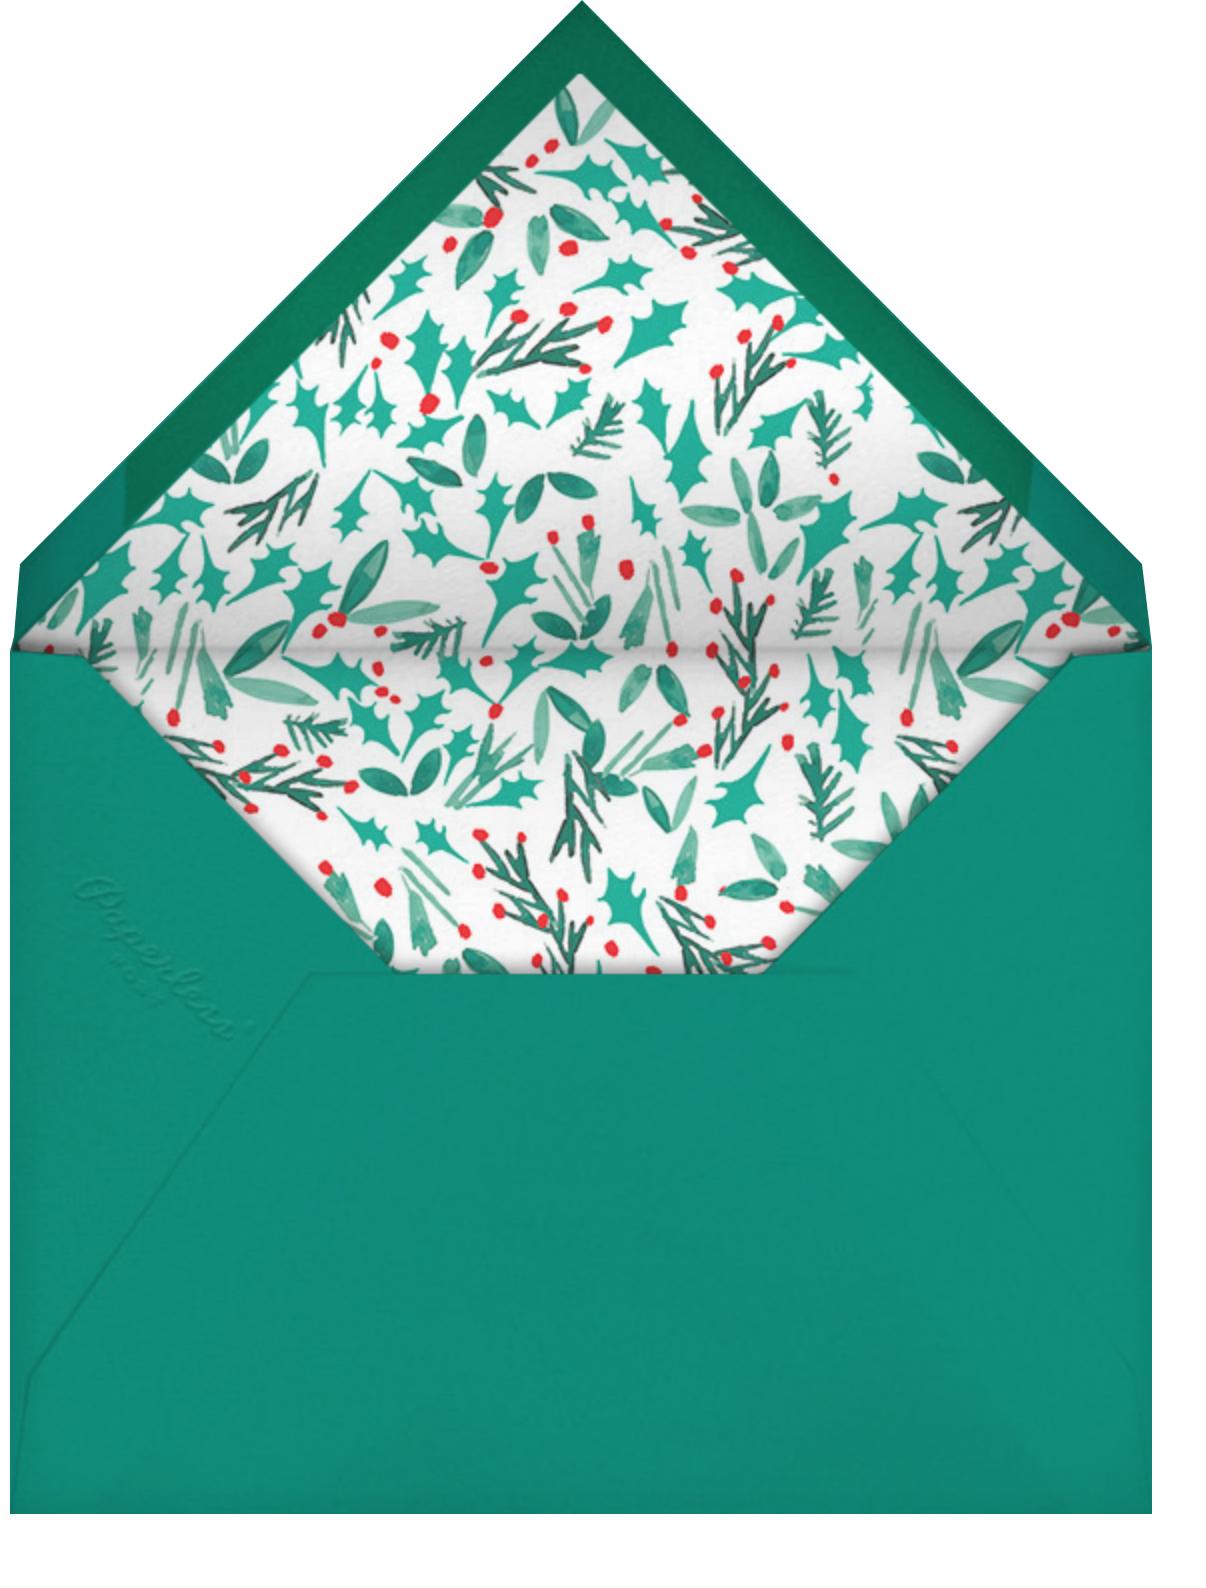 Let's Take a Chance - Mr. Boddington's Studio - Holiday cards - envelope back